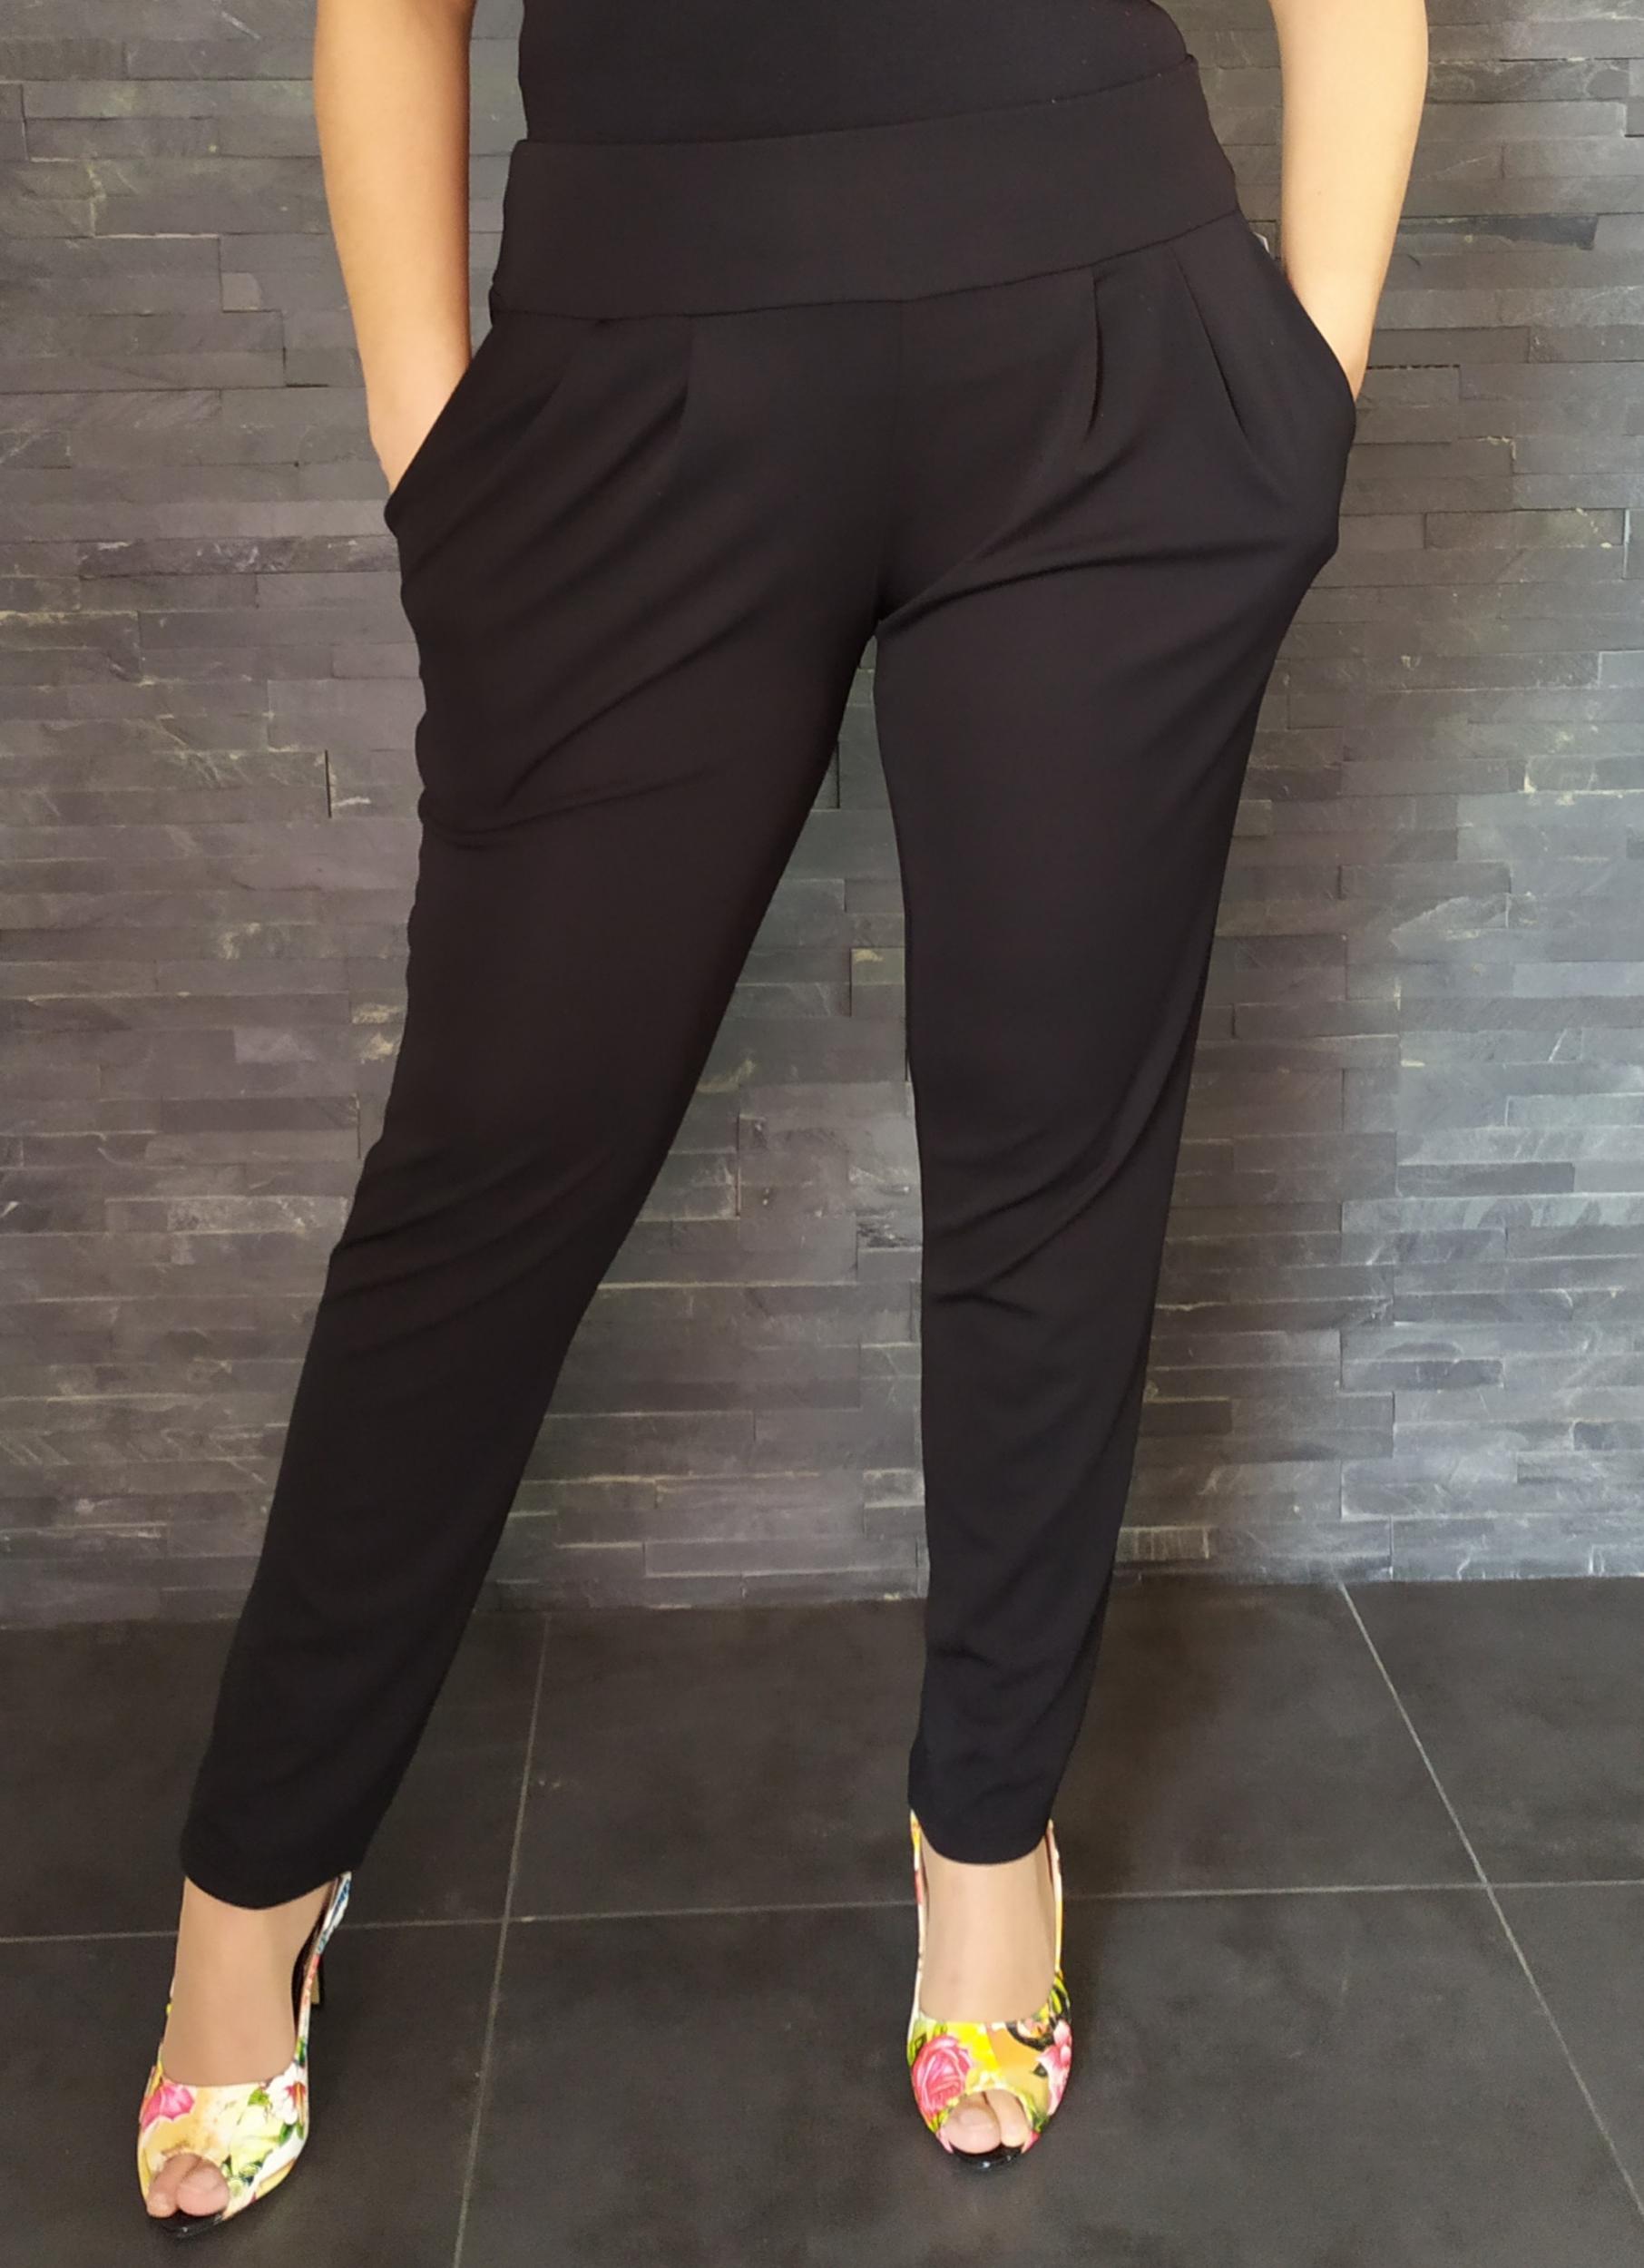 Pantalon chic avec poches